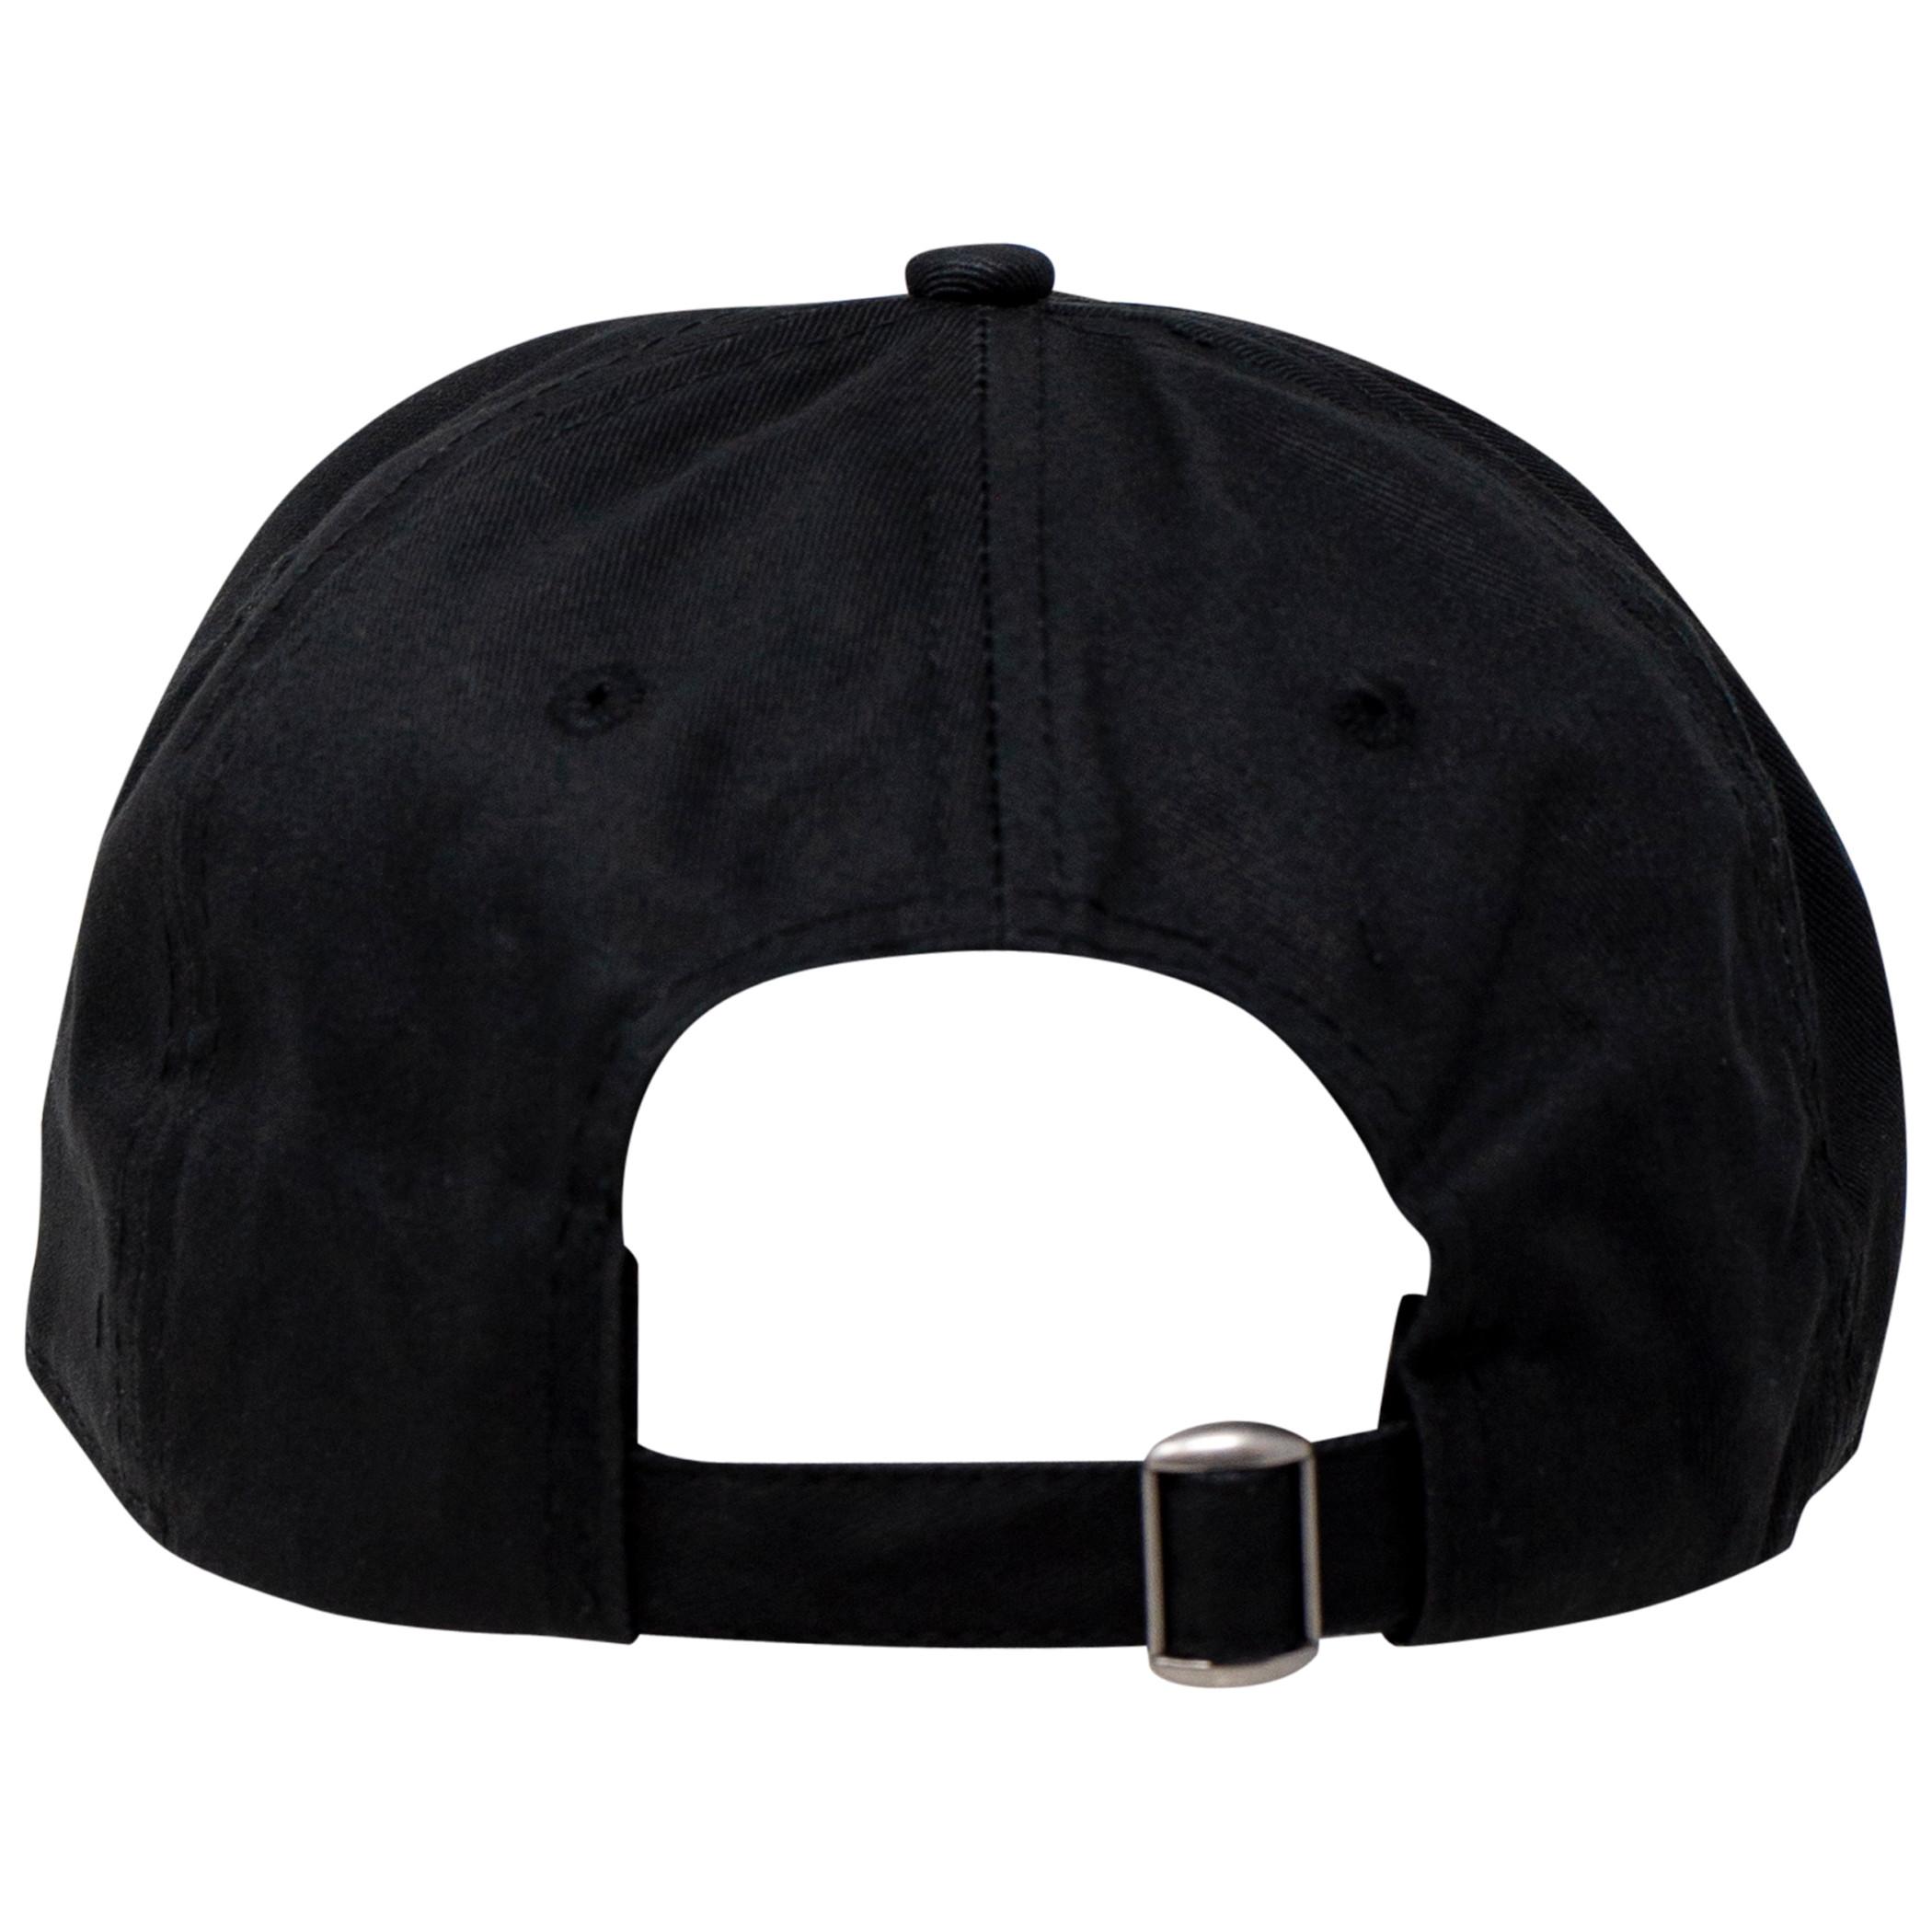 The Mandalorian The Child Adjustable Strapback Dad Hat